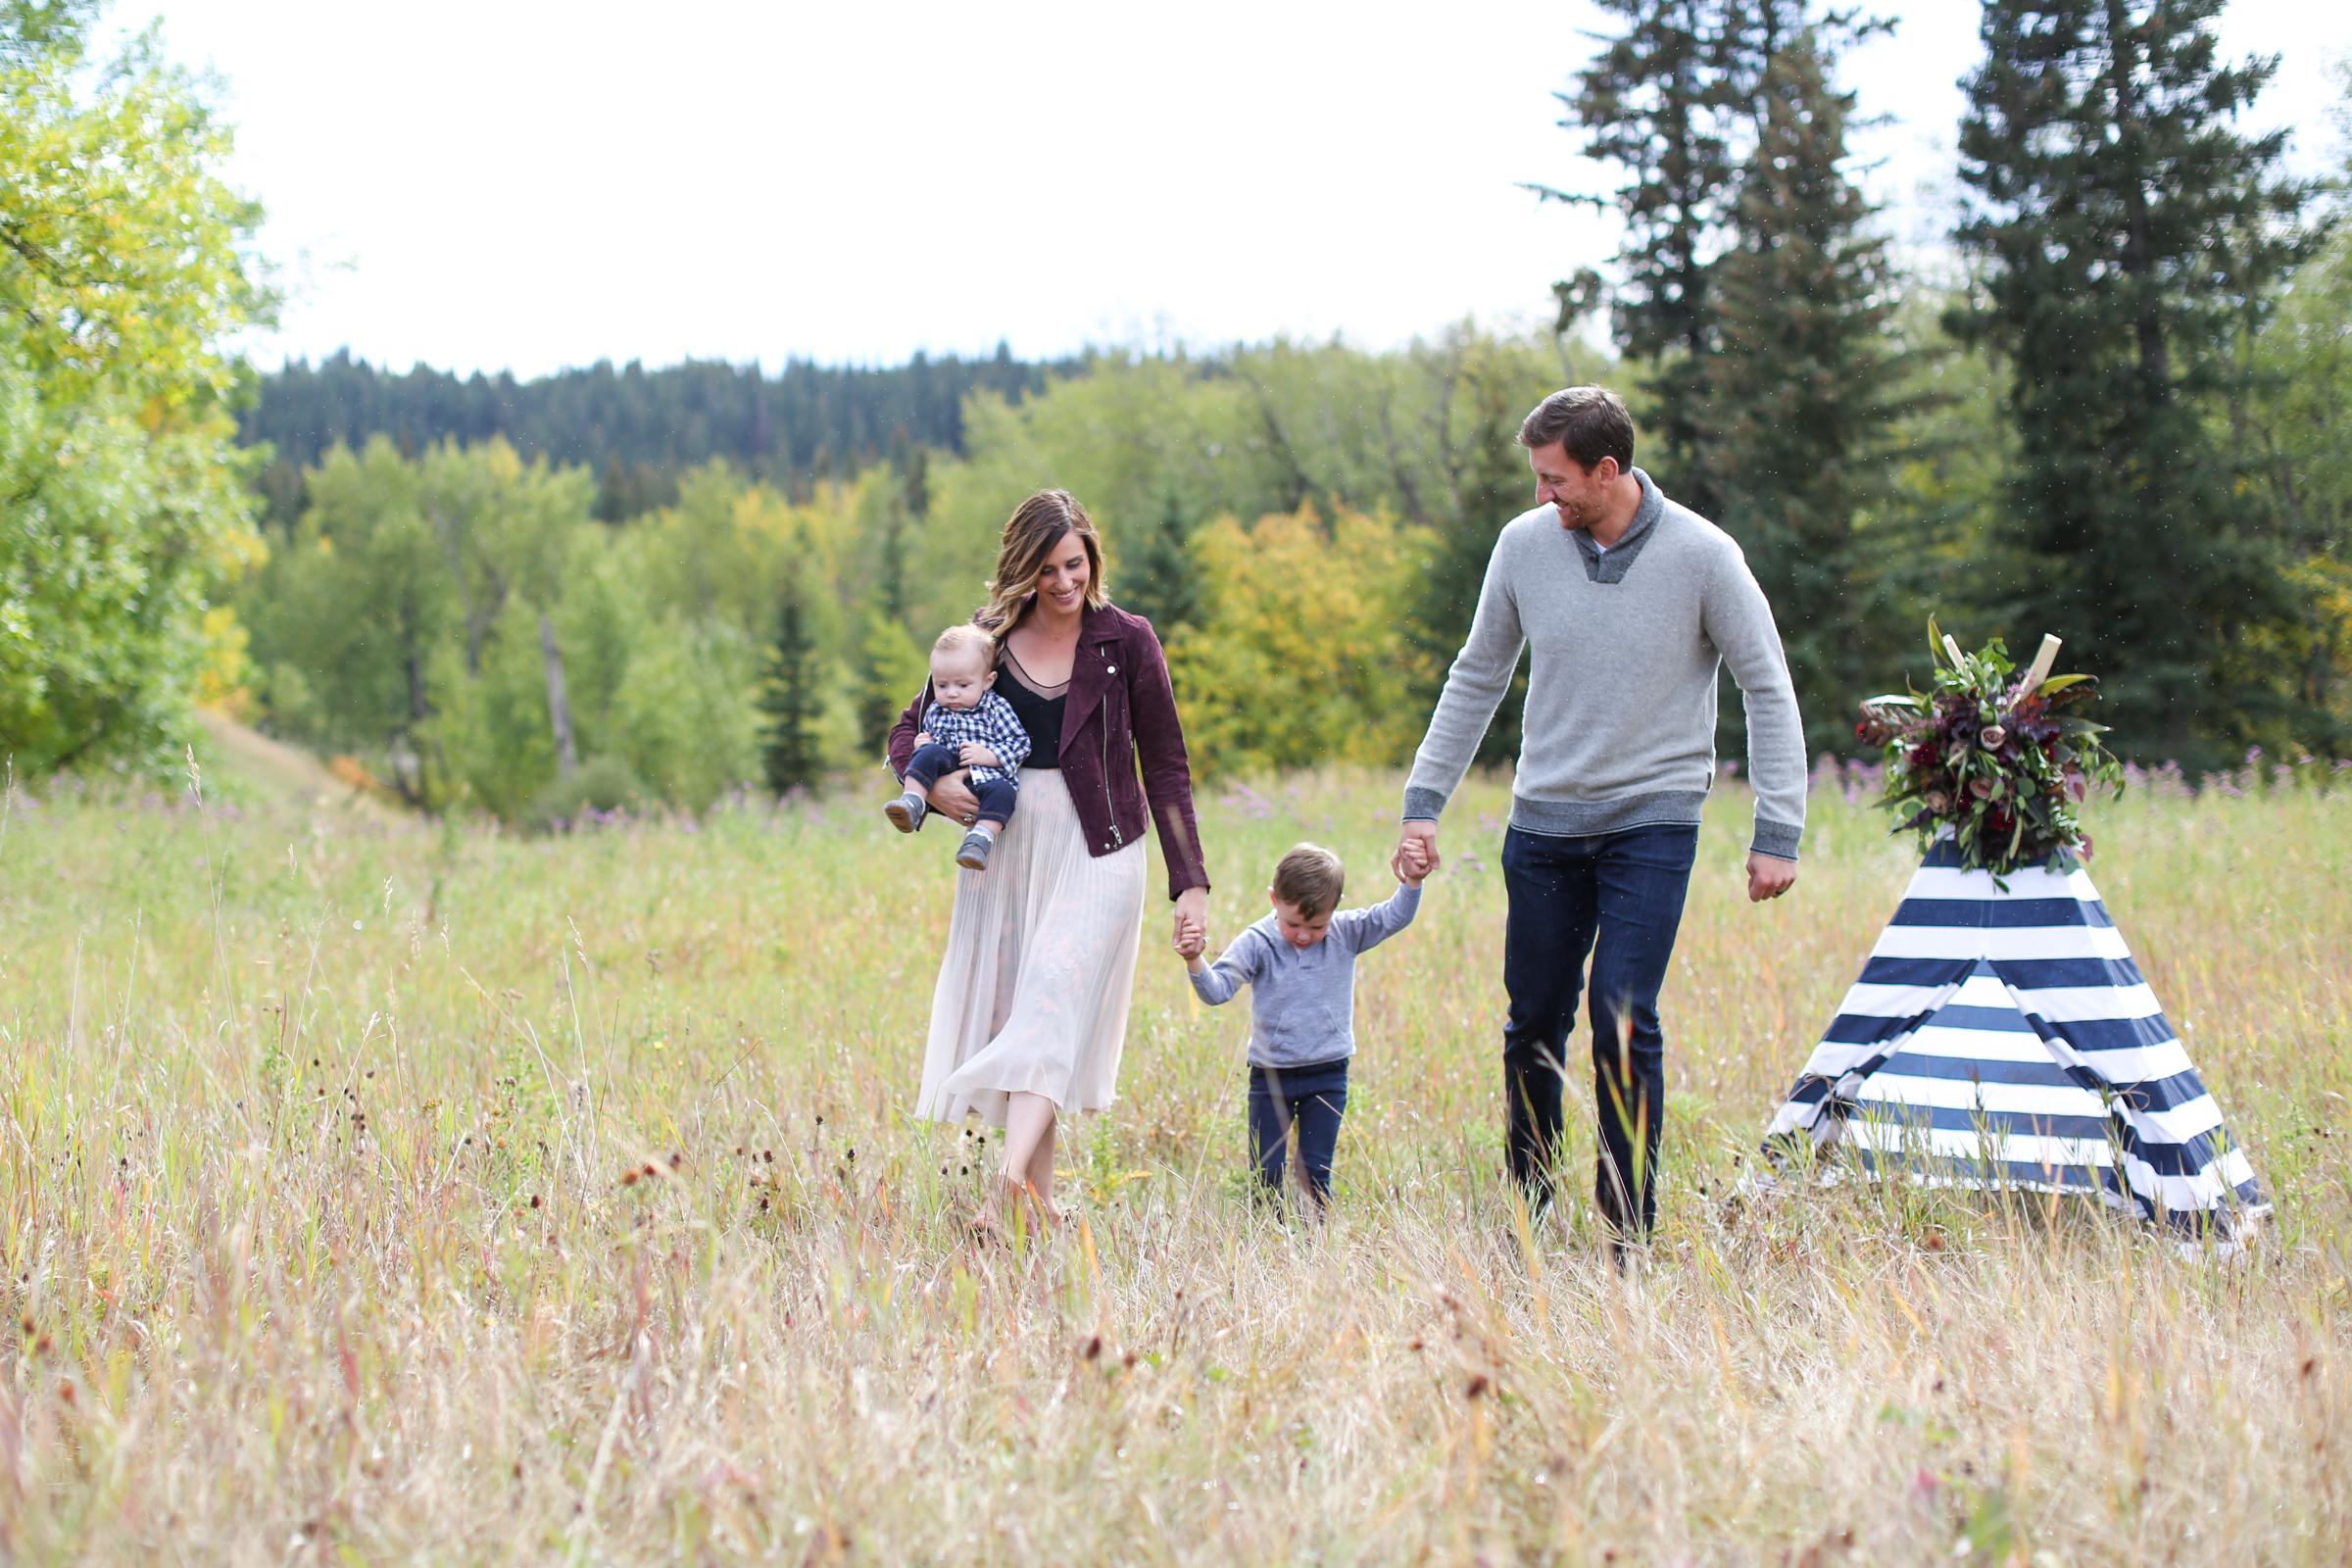 Fall-Family-Creative-Lindsay_Skeans_Photography-5.jpg